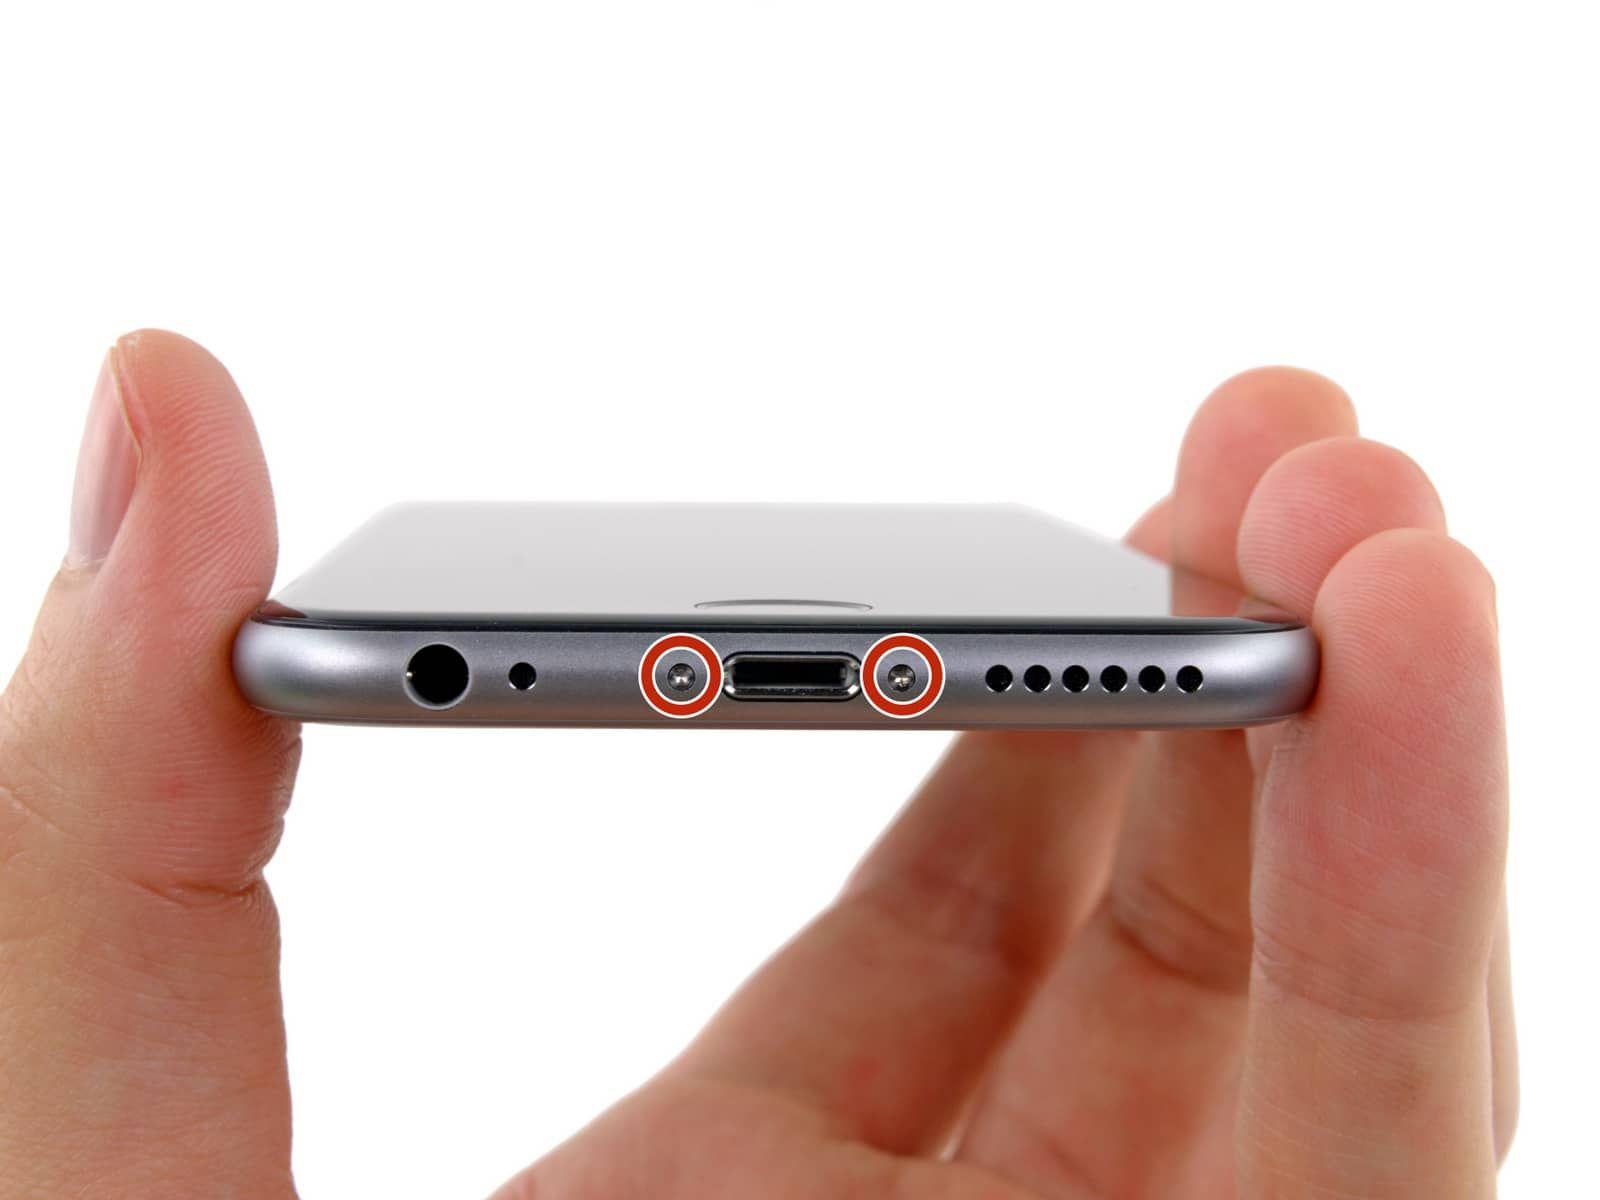 طريقة تغيير شاشة ايفون 6 و ايفون 6 بلس افضل شاشة ايفون 6 في امازون Unlock Iphone Icloud Iphone